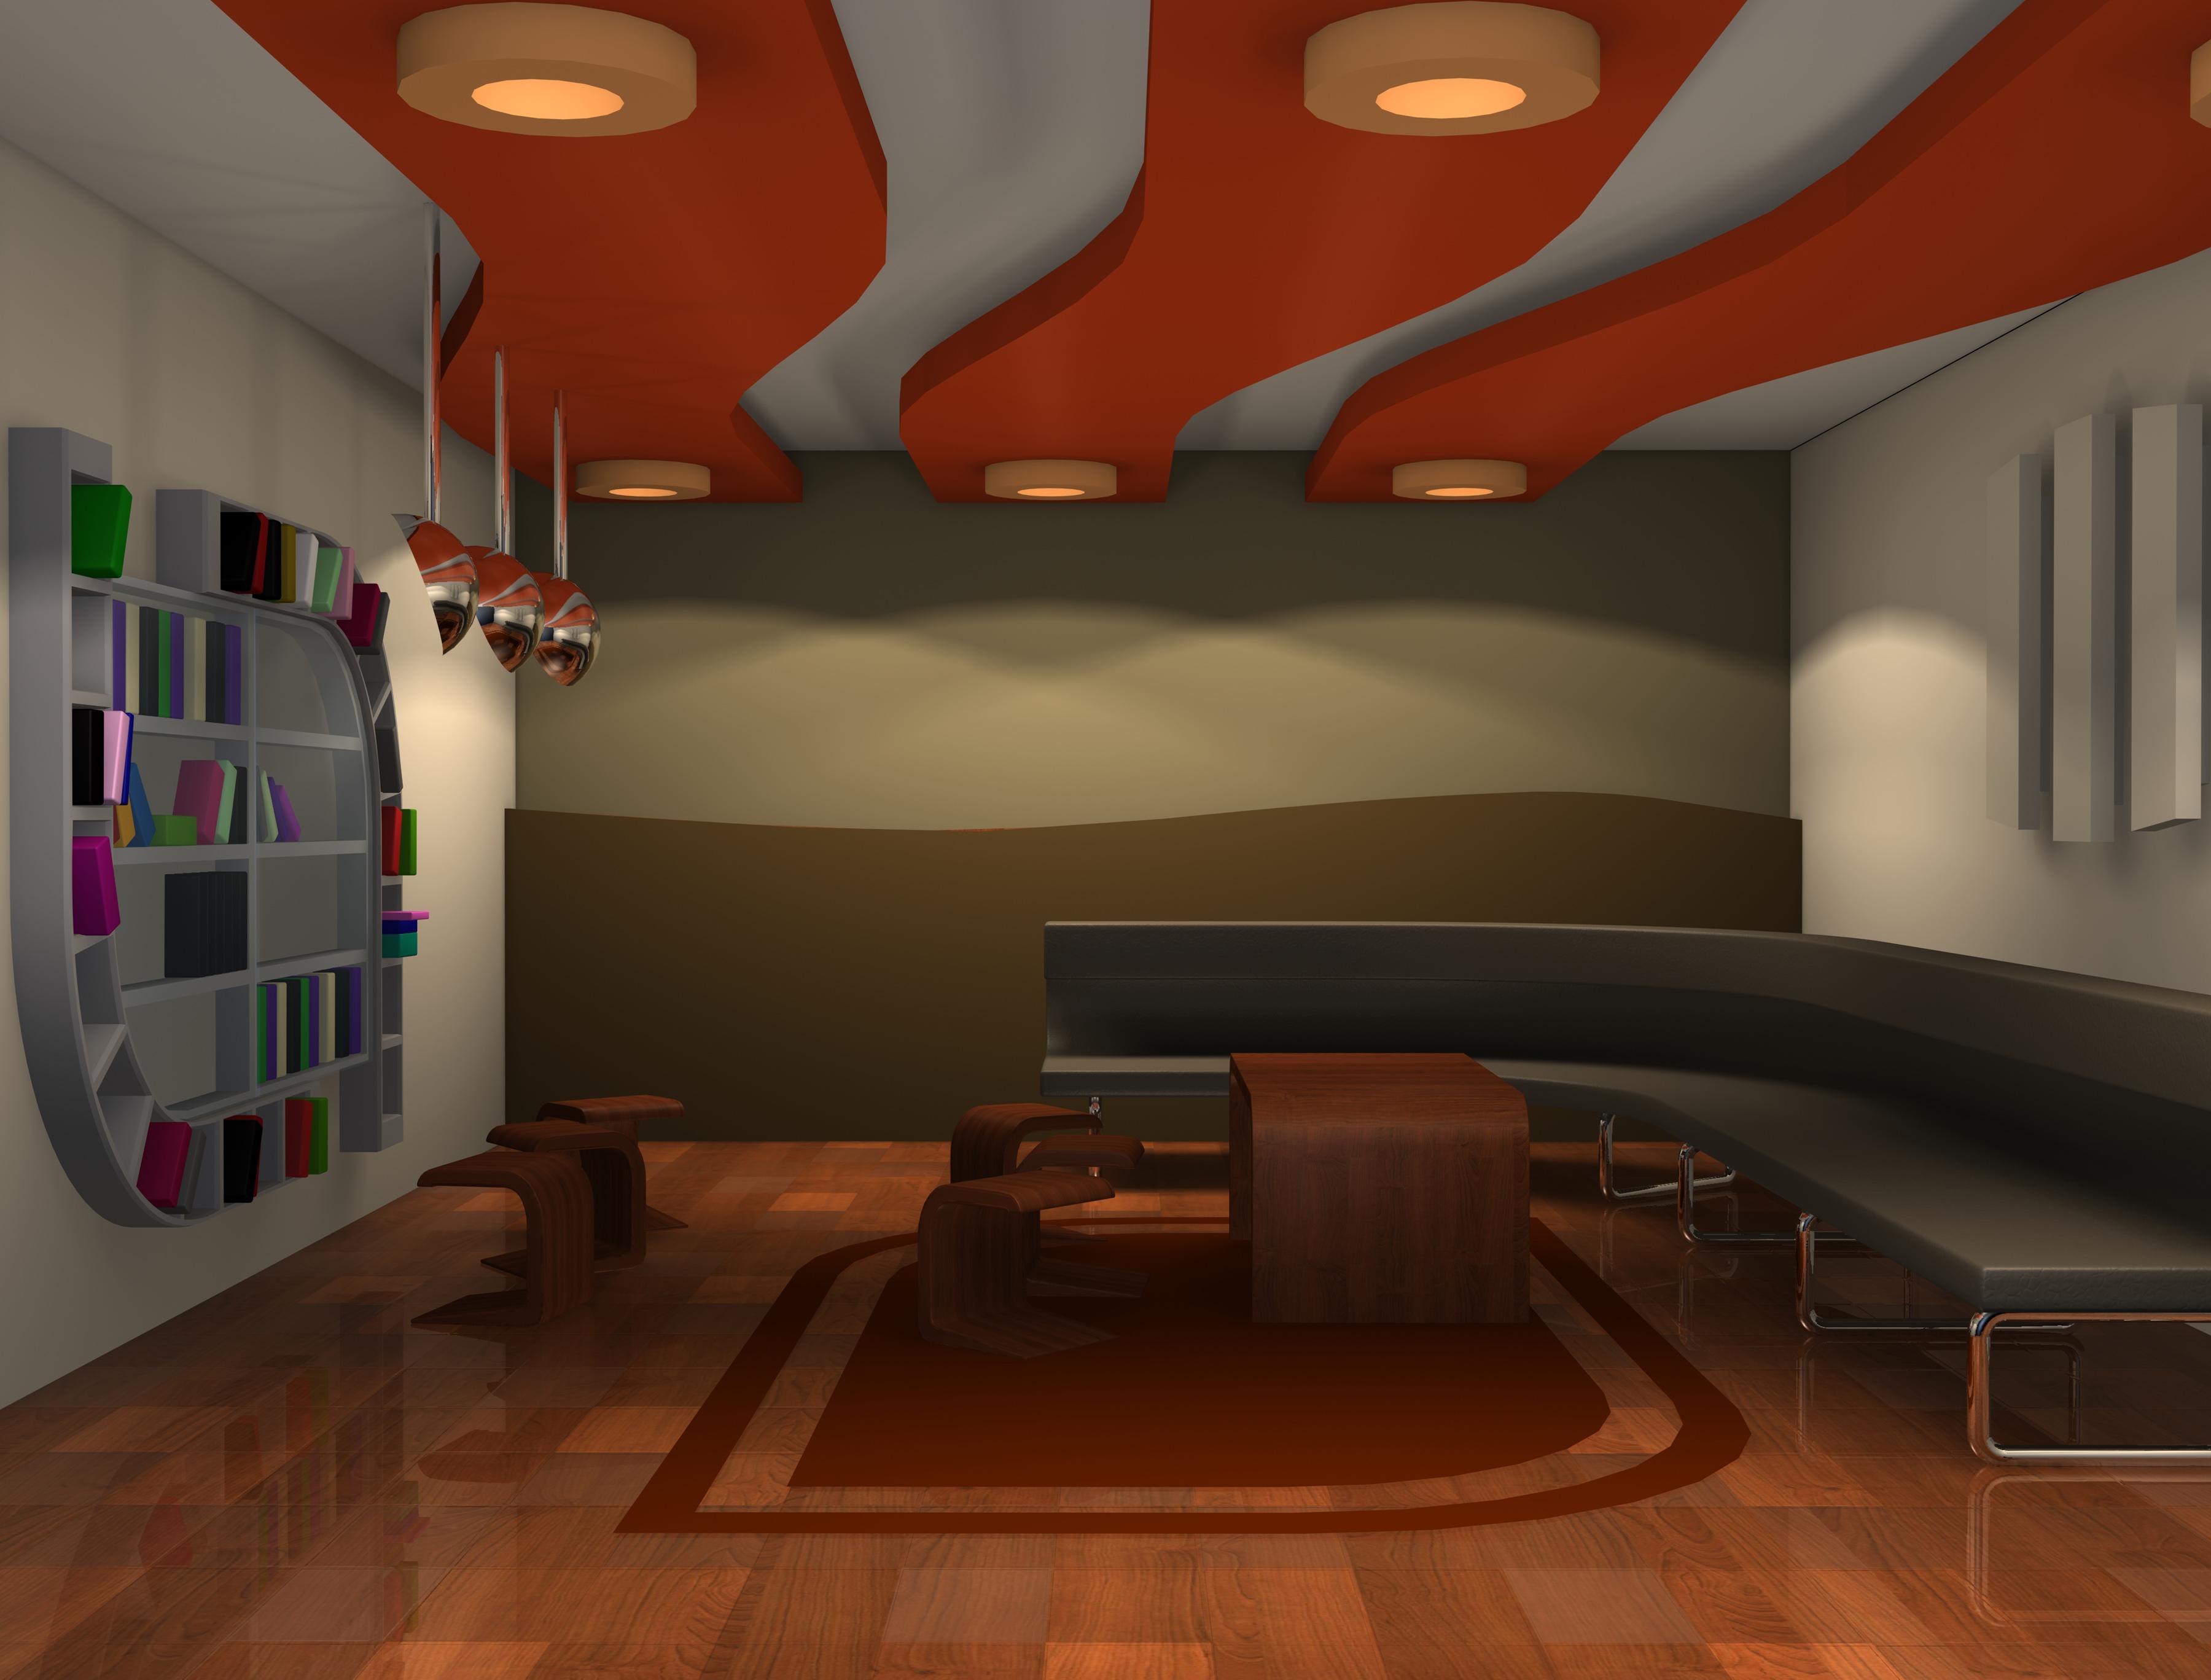 3d studio max by umair ahmed khatri at for 3d studio max